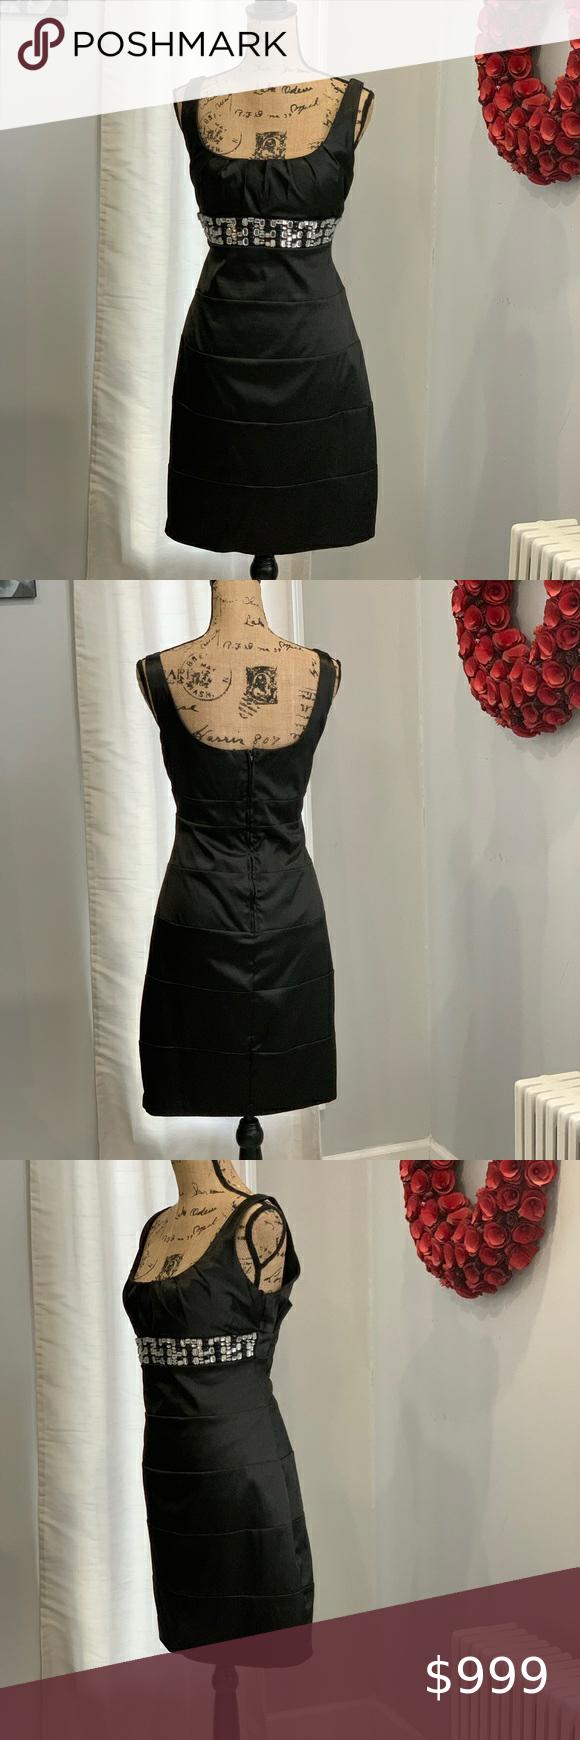 Bisou Bisou Black Dress Size 14 Black Dress Size 14 Black Dress Dresses [ 1740 x 580 Pixel ]